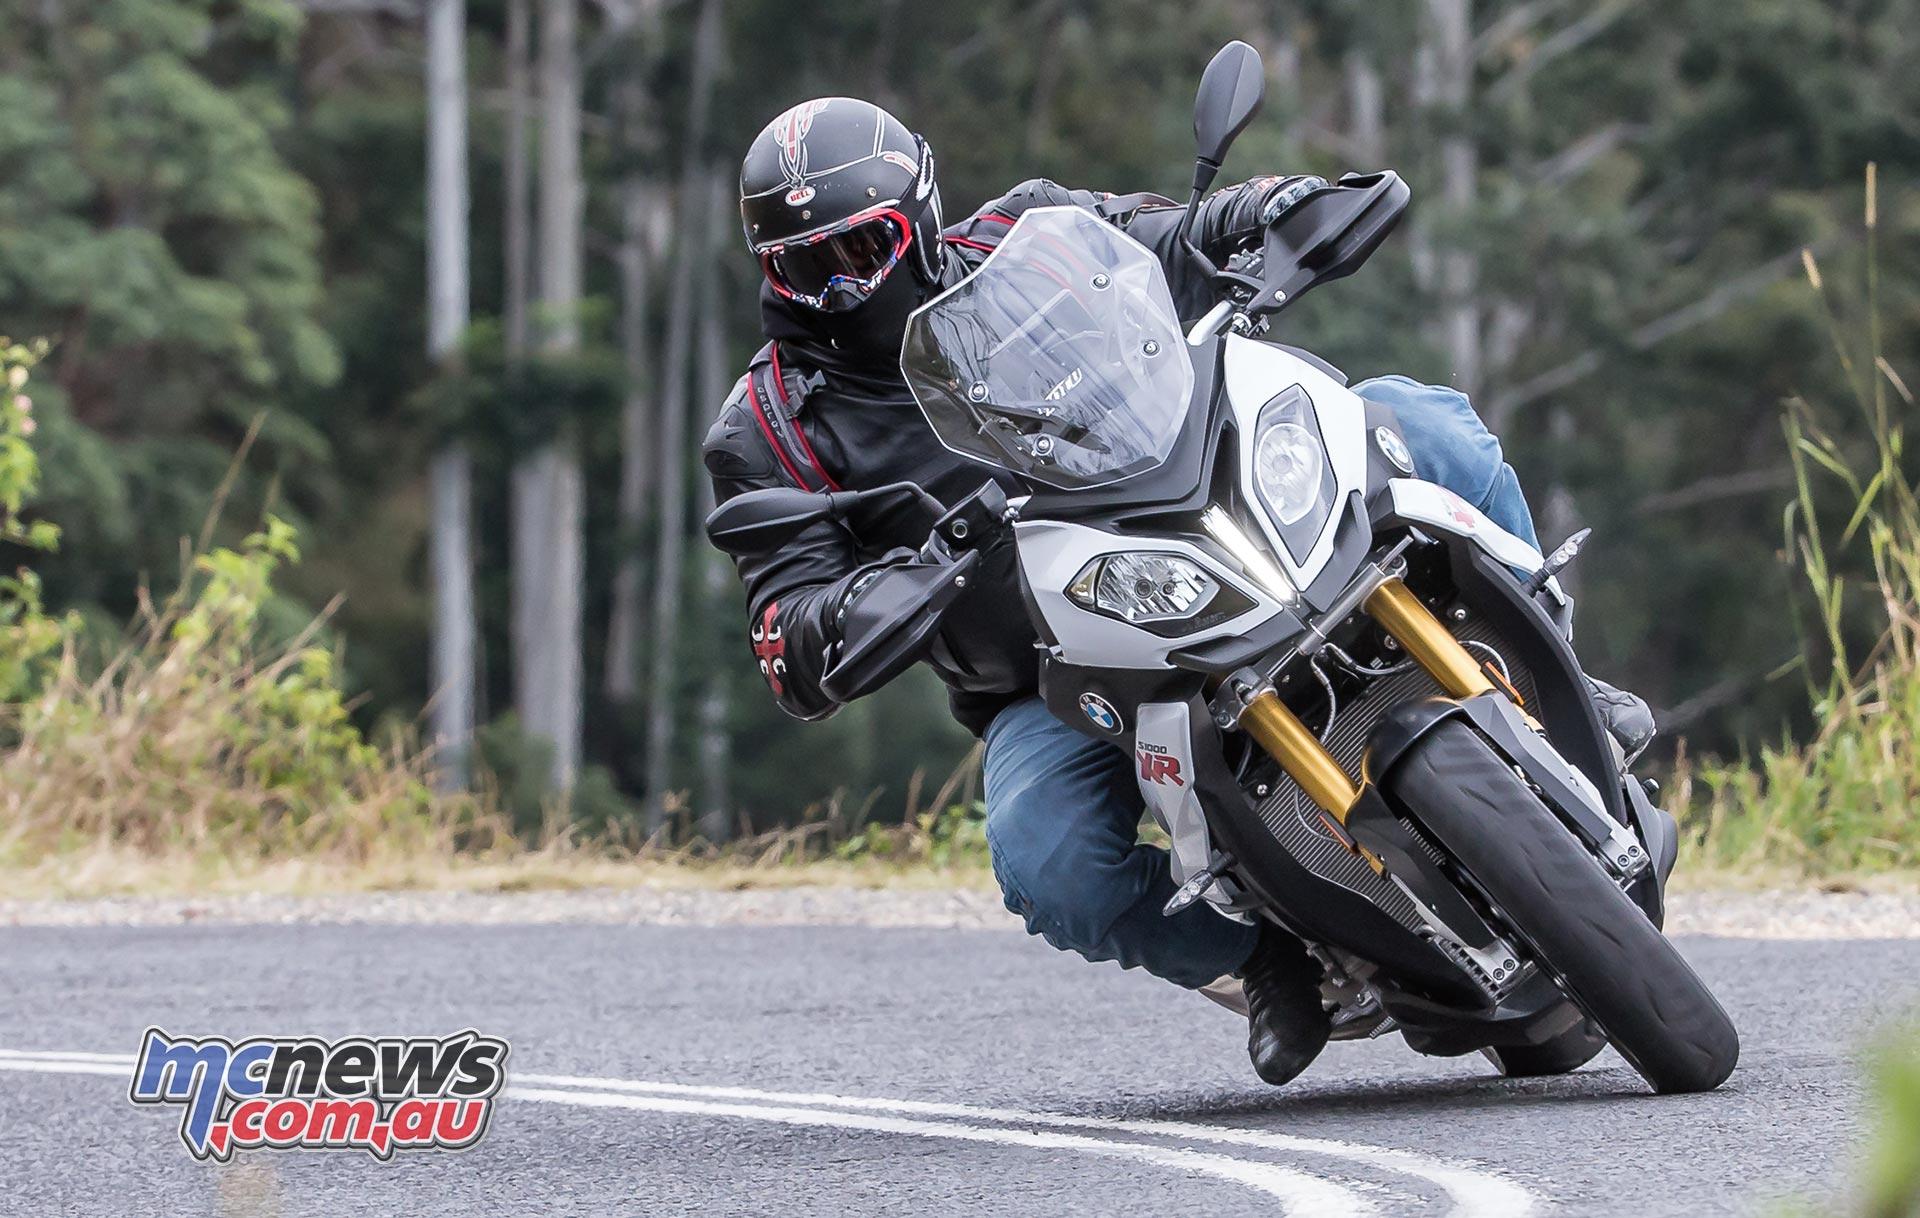 Bmw S 1000 Xr Review Test By Boris Mcnews Com Au